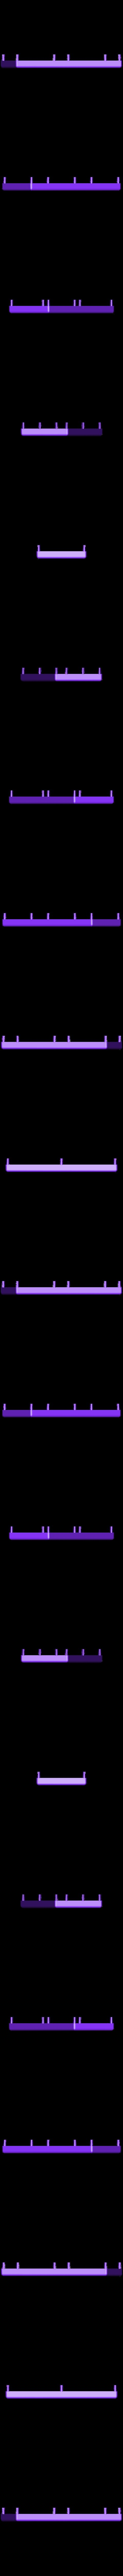 DIYcellphoneLED-02-bottom.STL Télécharger fichier STL gratuit DIY Cellphone Body • Objet imprimable en 3D, CWandT